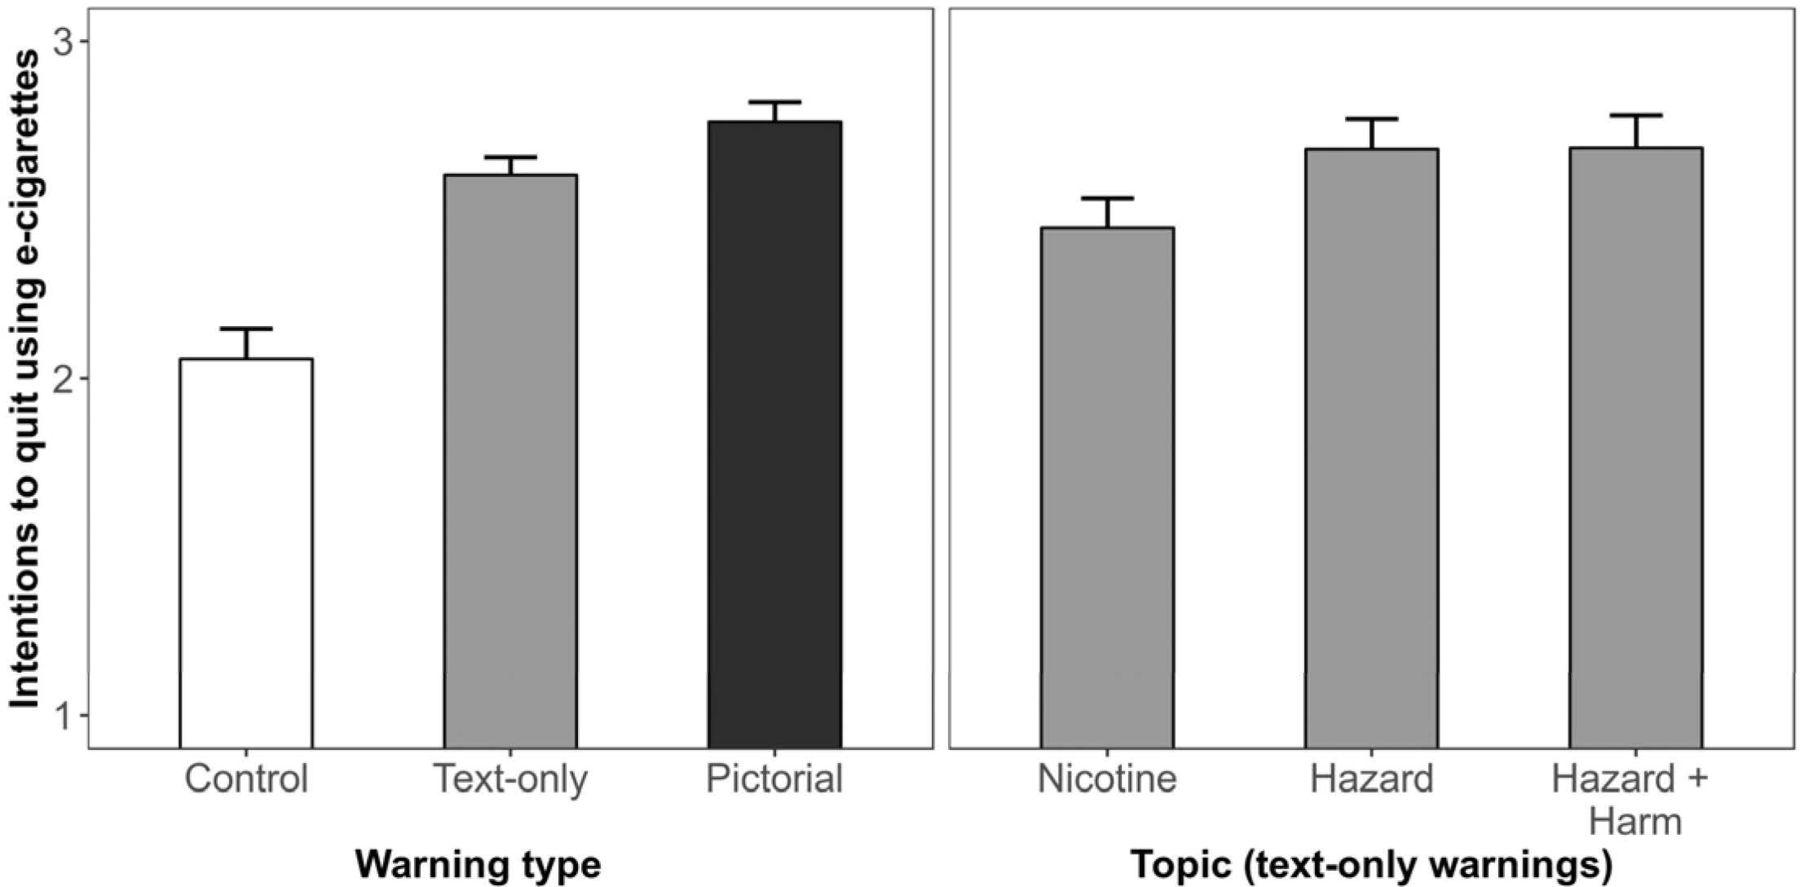 Impact of e-cigarette health warnings on motivation to vape